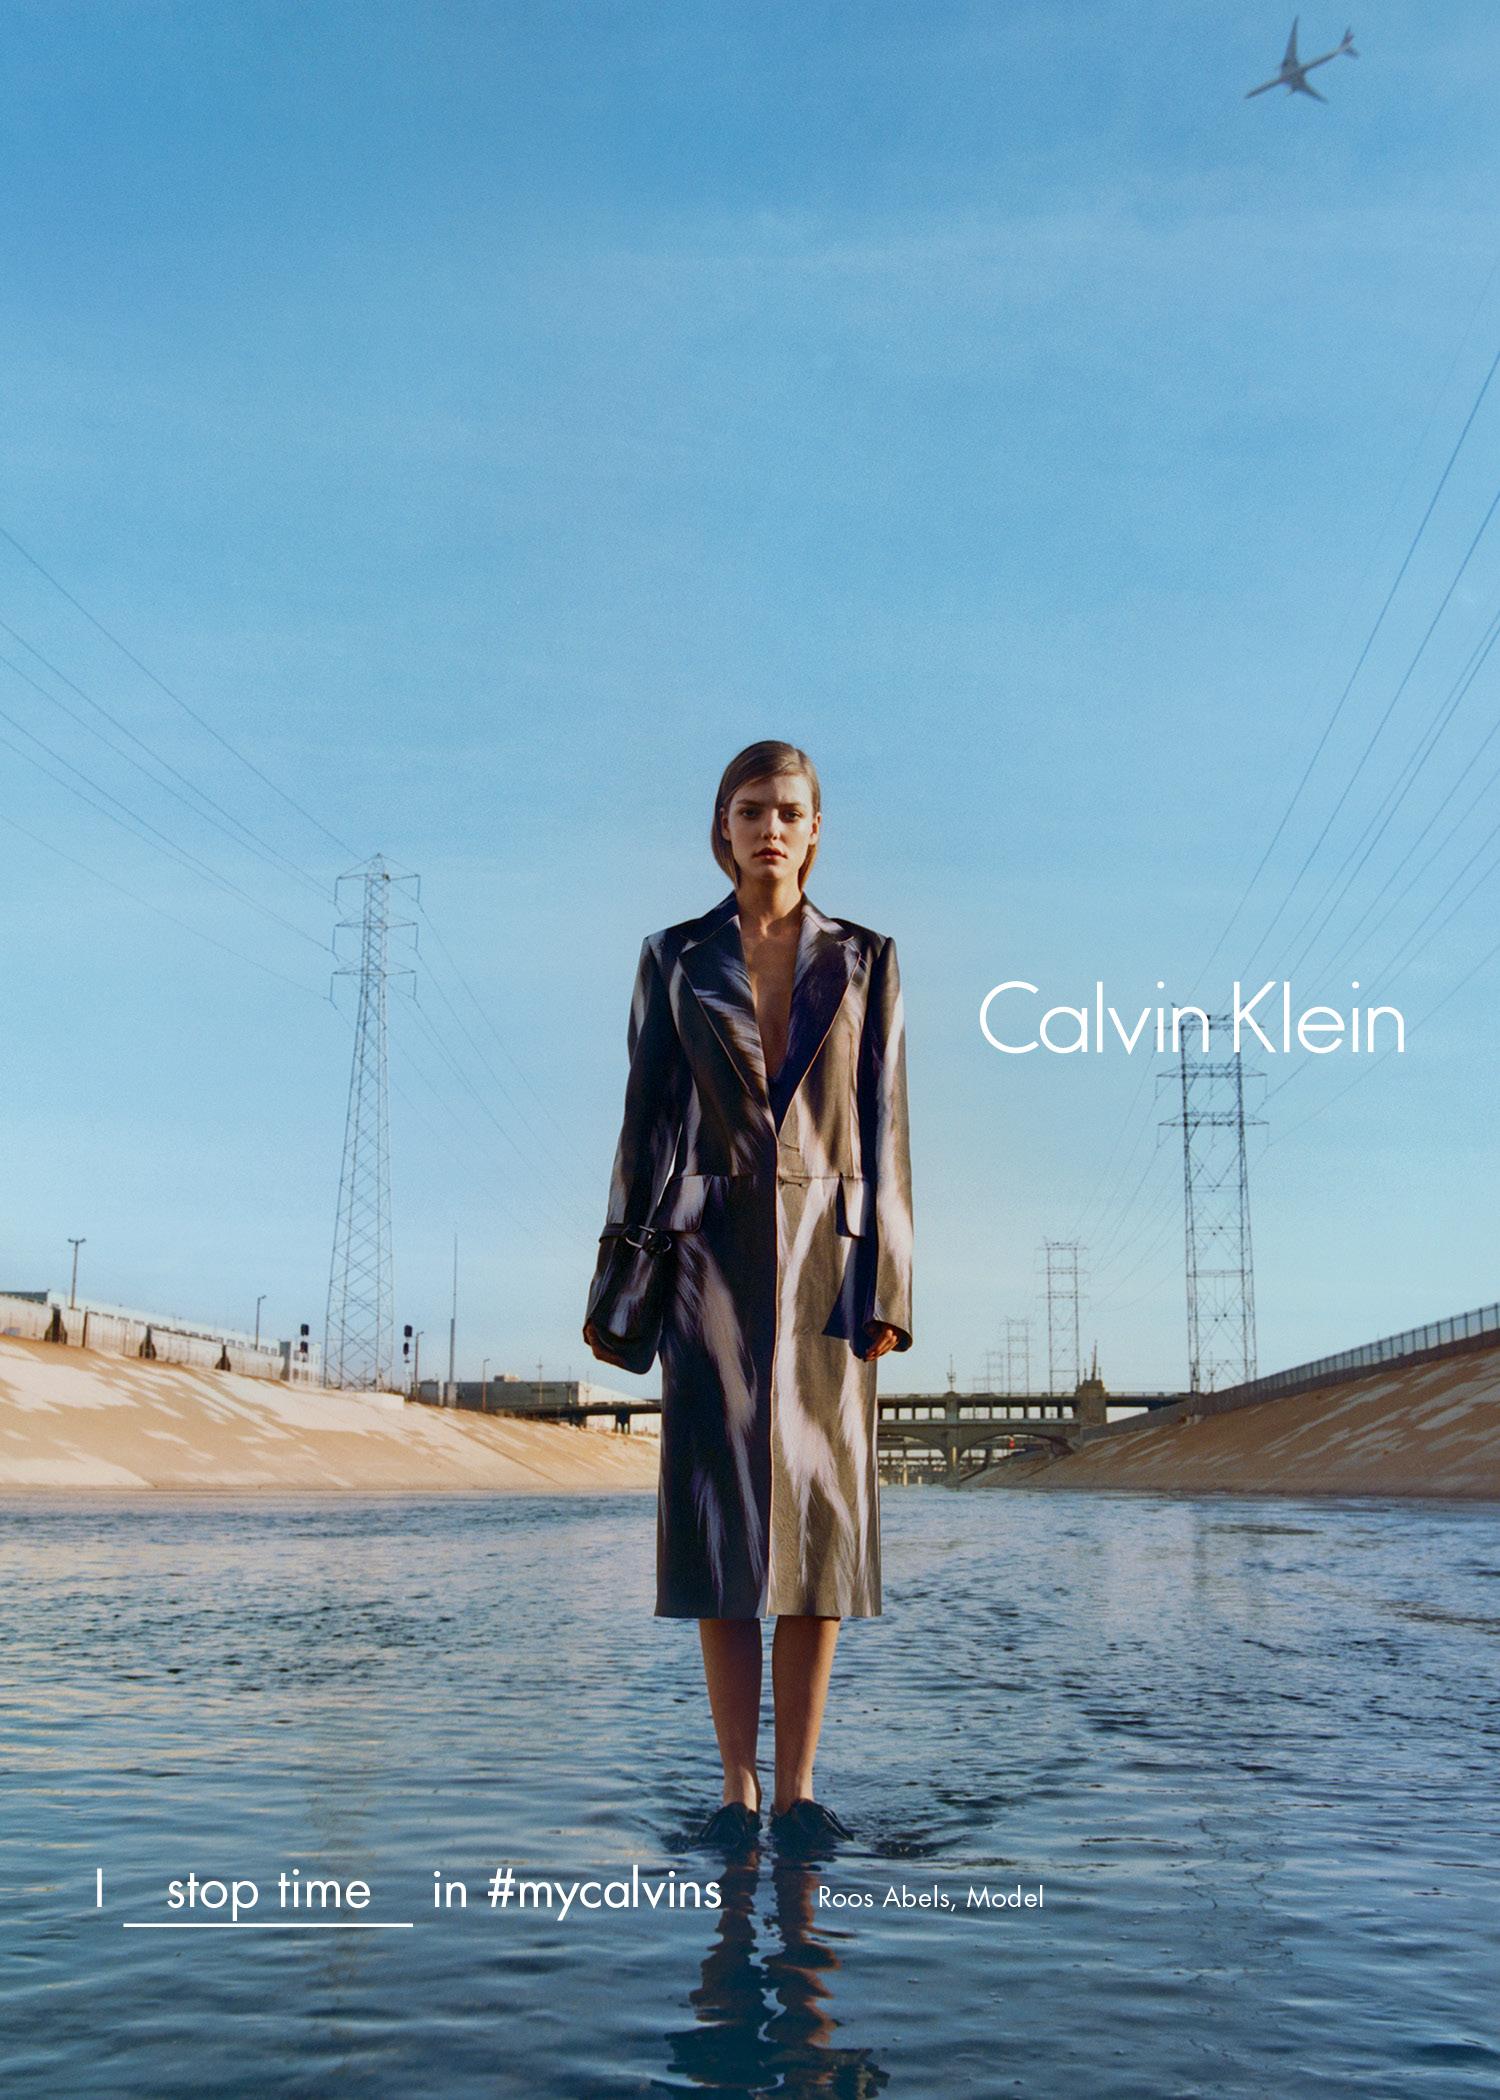 calvin-klein-fall-2016-campaign-abels_ph_tyrone-lebon-130